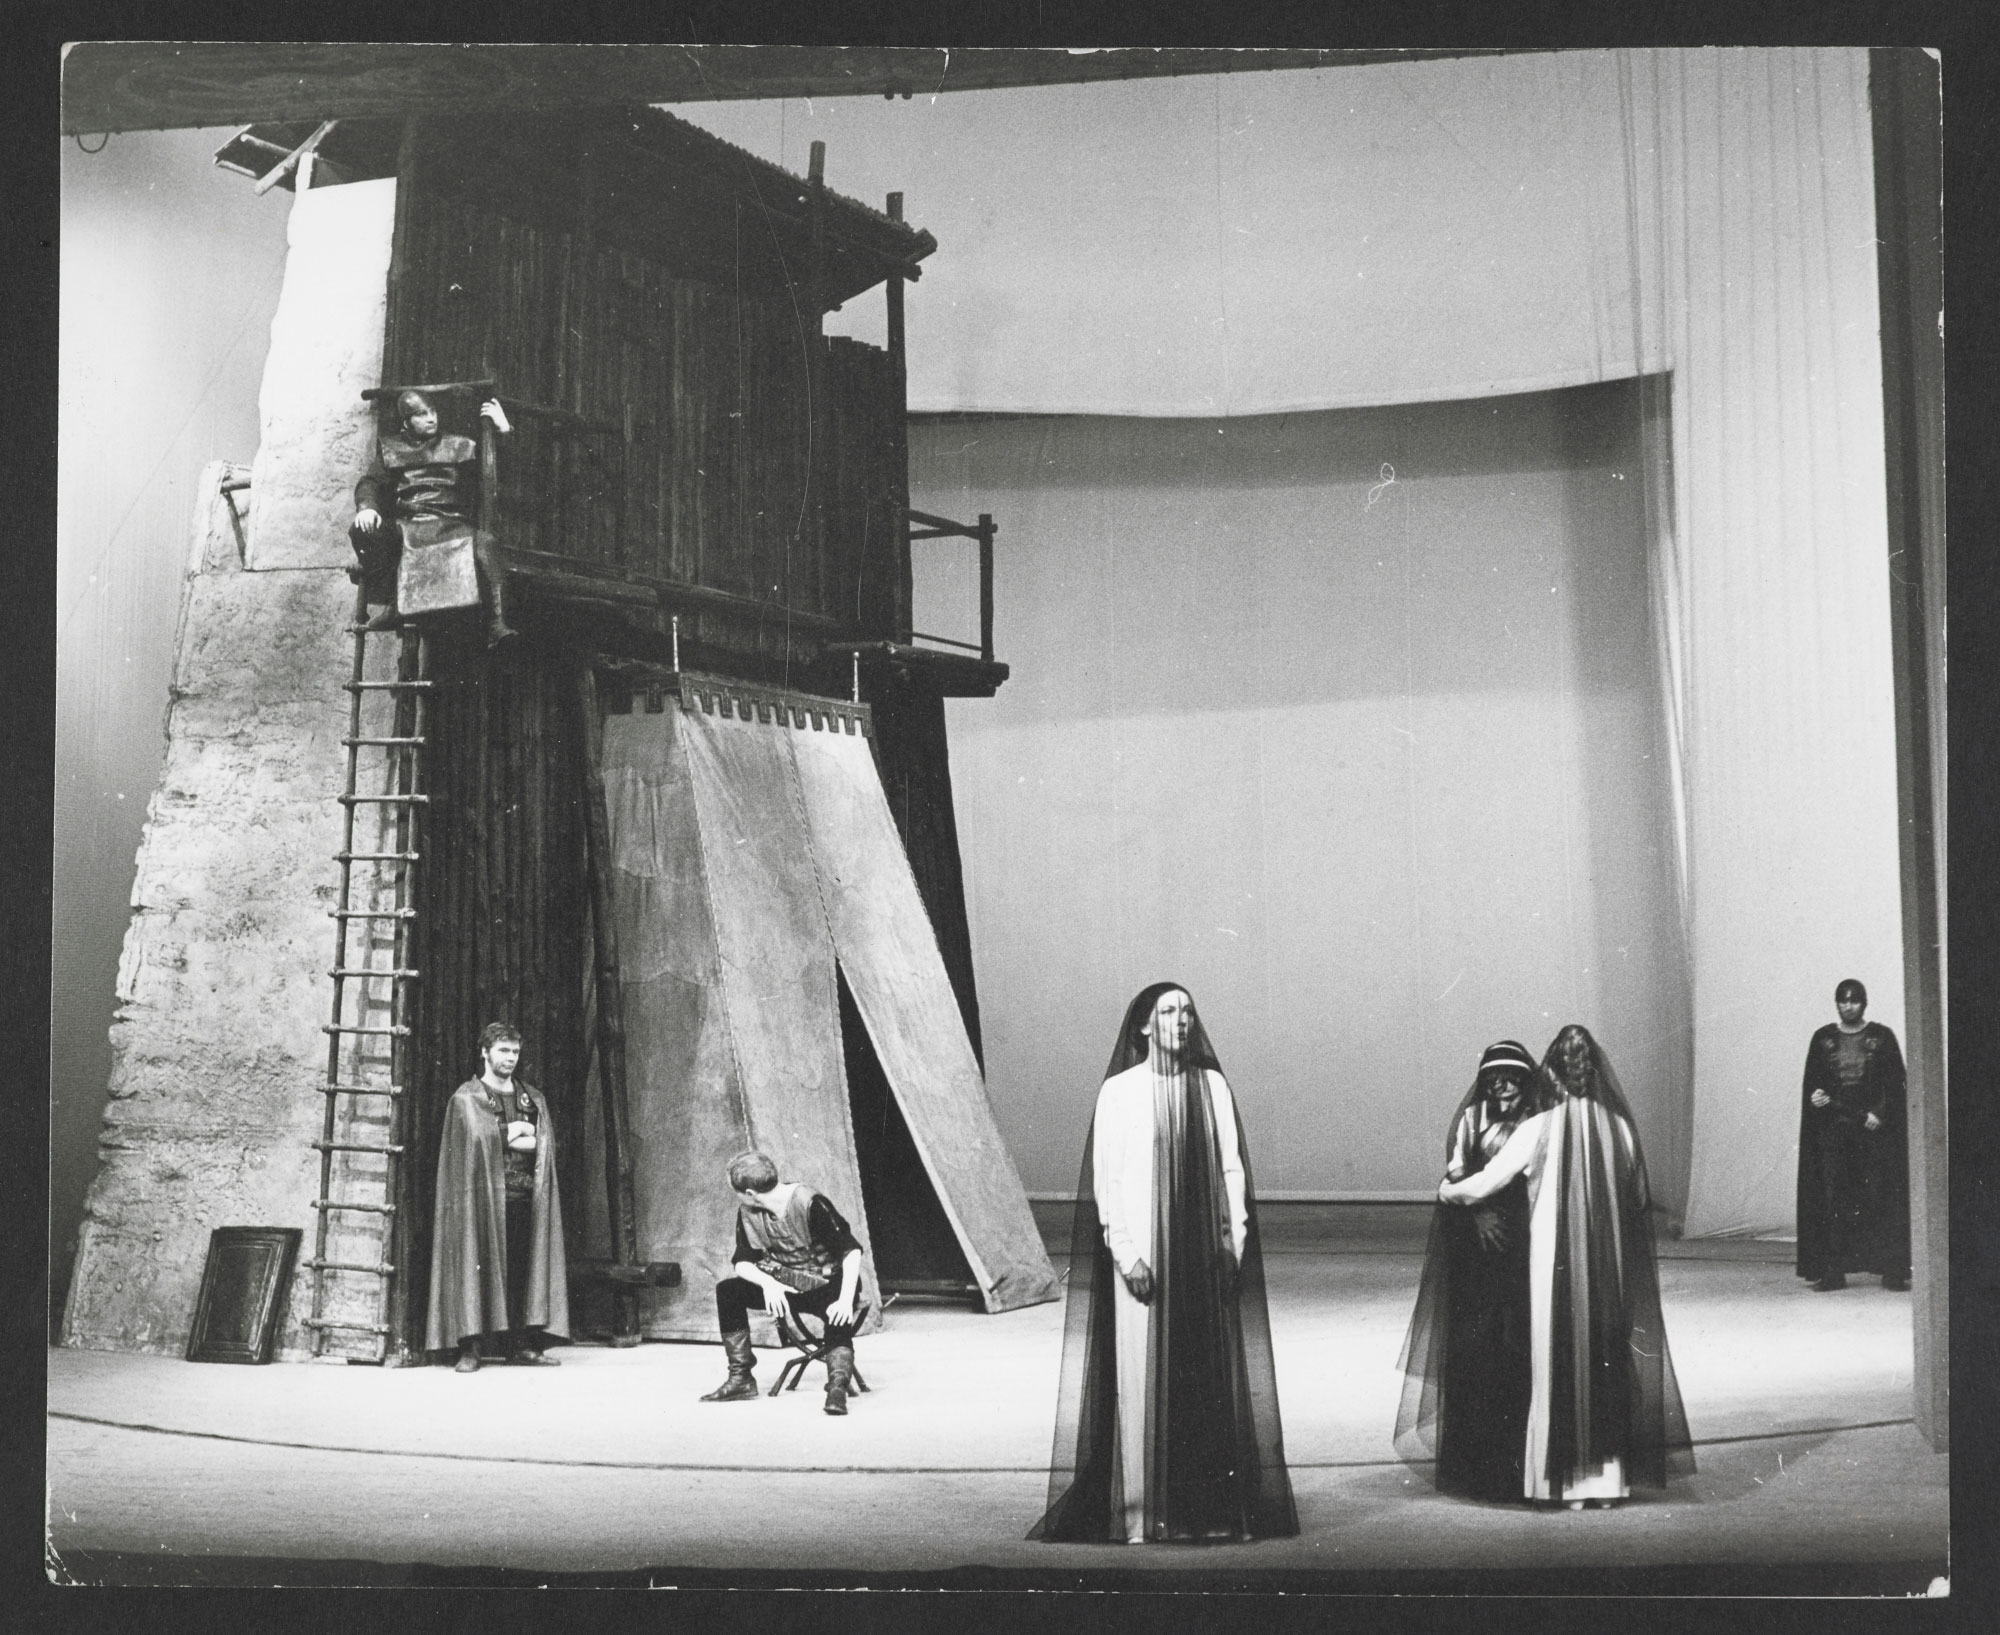 Photographs of Berliner Ensemble's Coriolanus